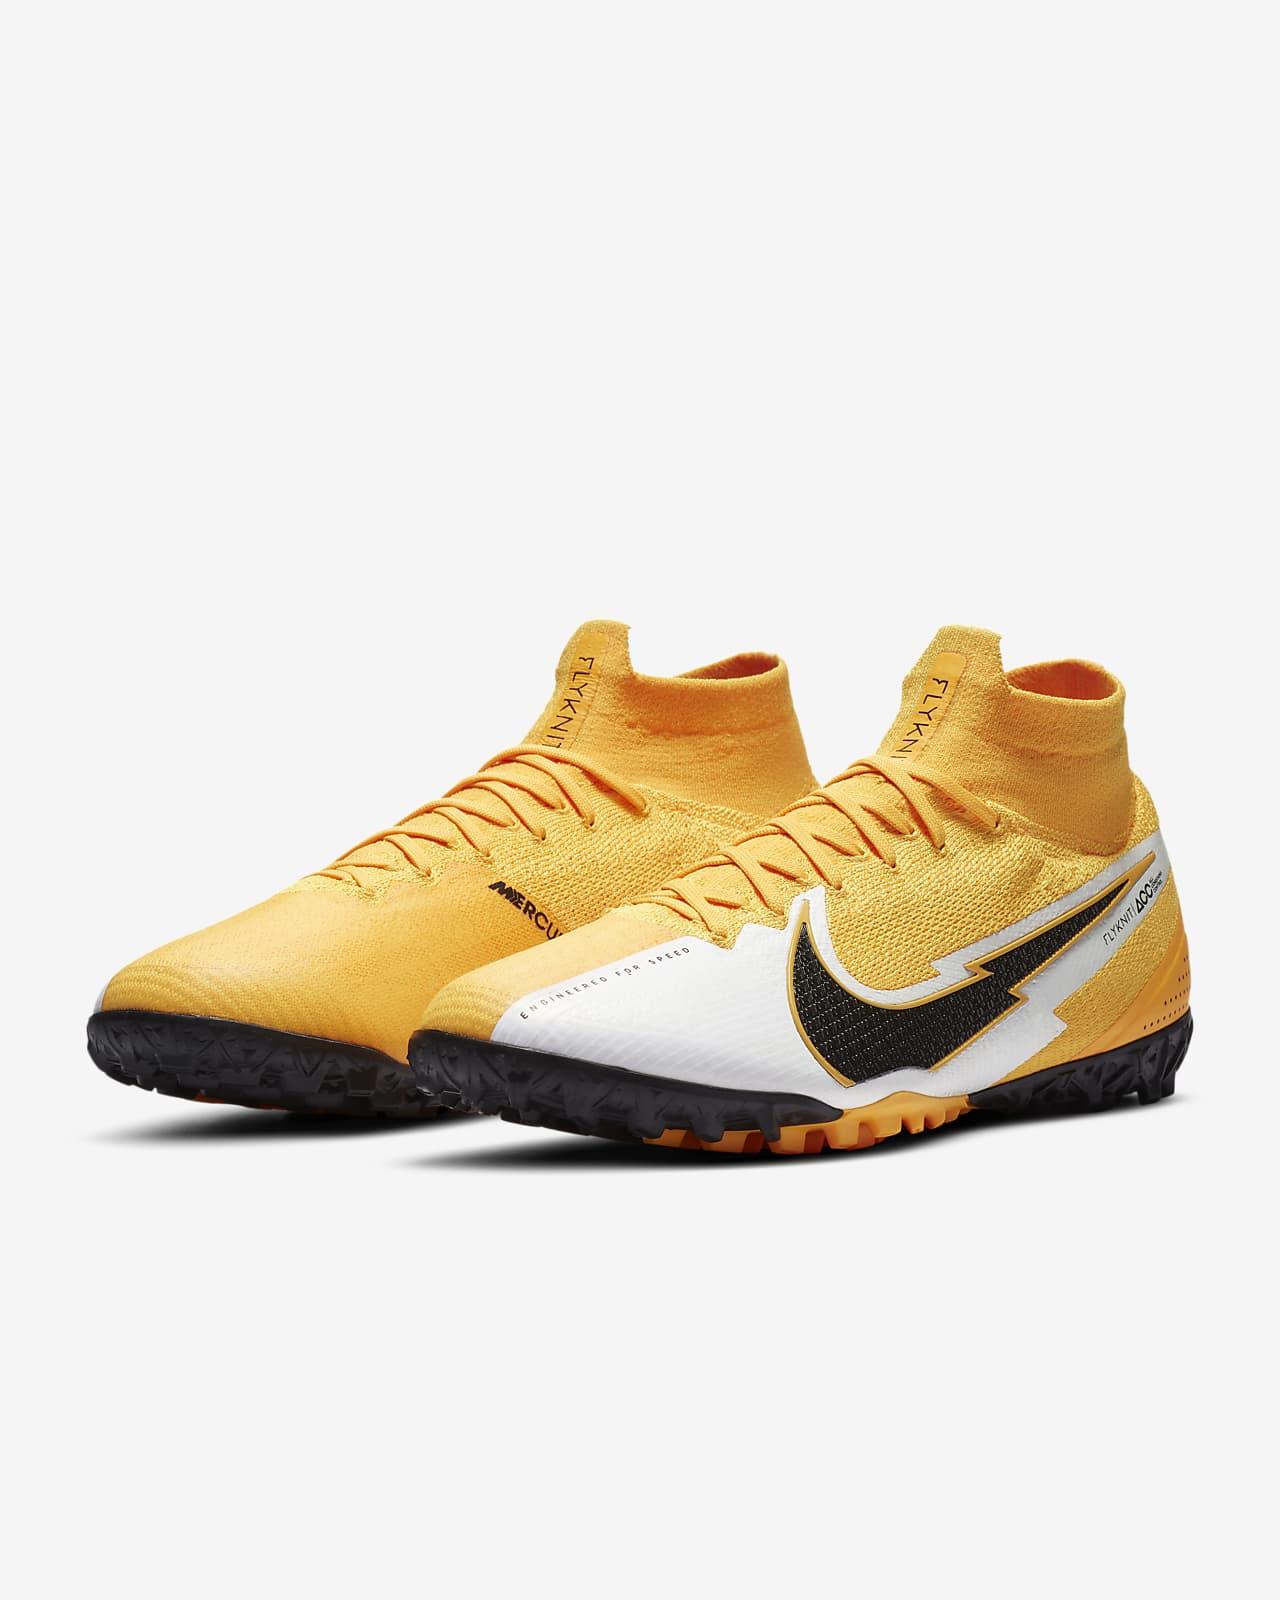 torpe Velocidad supersónica oyente  Nike Mercurial Superfly 7 Elite TF Artificial-Turf Soccer Shoe. Nike.com